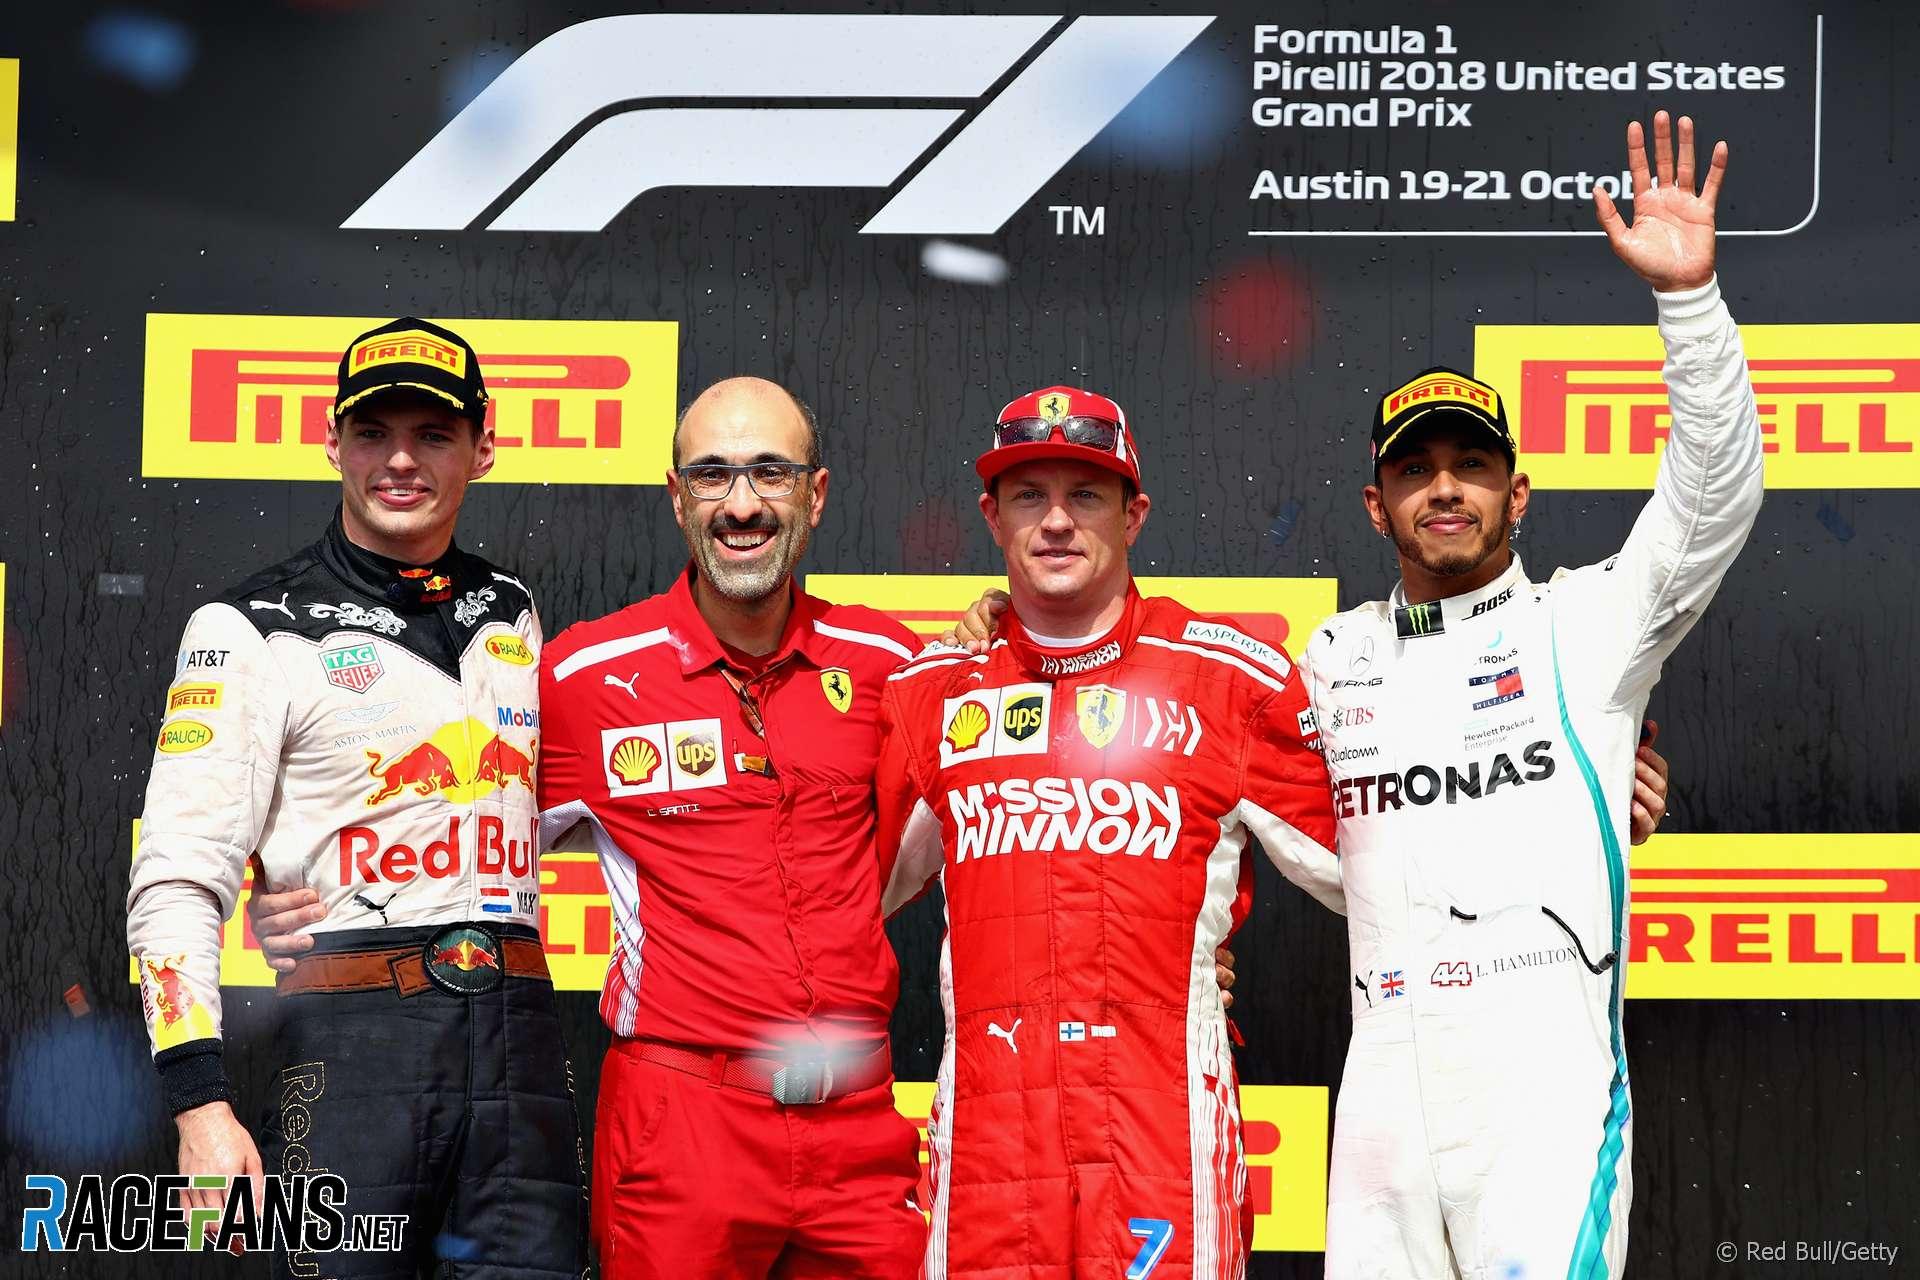 Max Verstappen, Kimi Raikkonen, Lewis Hamilton, Circuit of the Americas, 2018